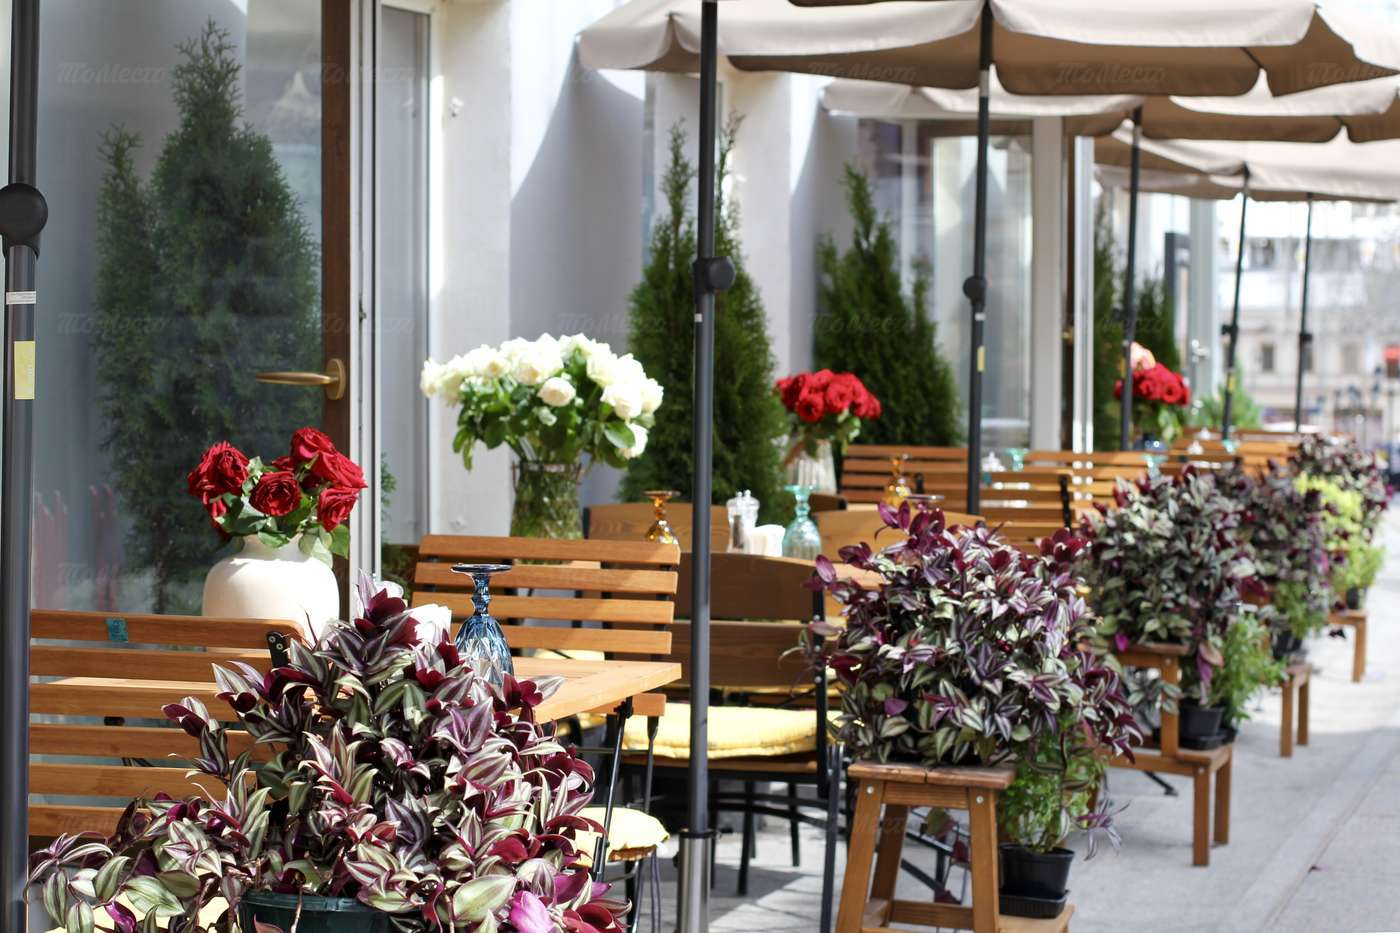 Ресторан IL LETTERATO (Литератор) На Большой Дмитровке фото 9